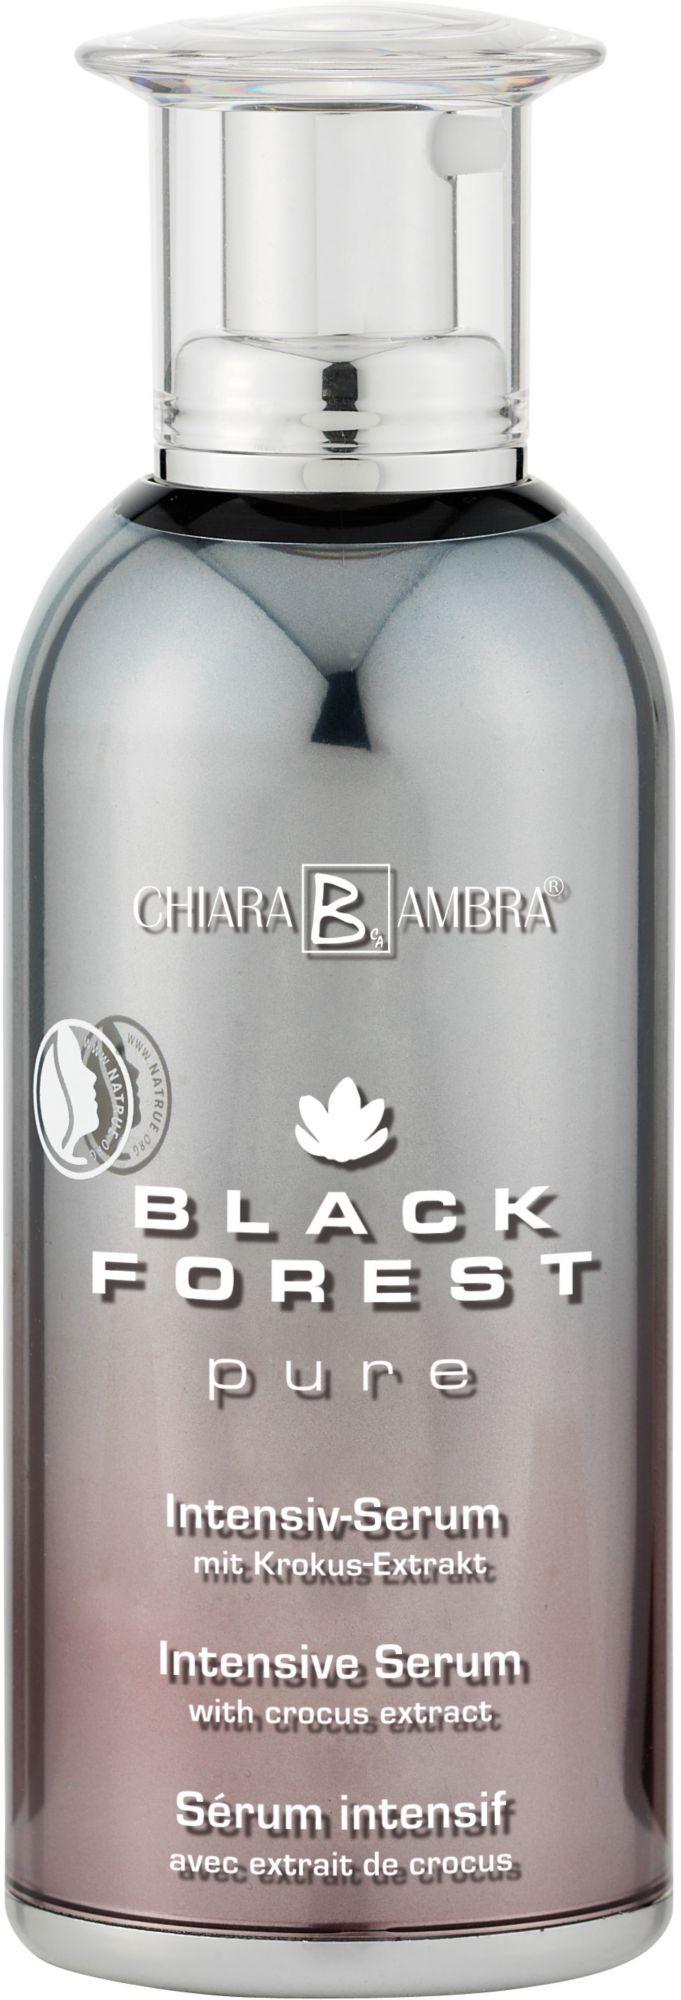 CHIARA AMBRA BF Pure Intensive Serum Chiara B. Ambra schwarz